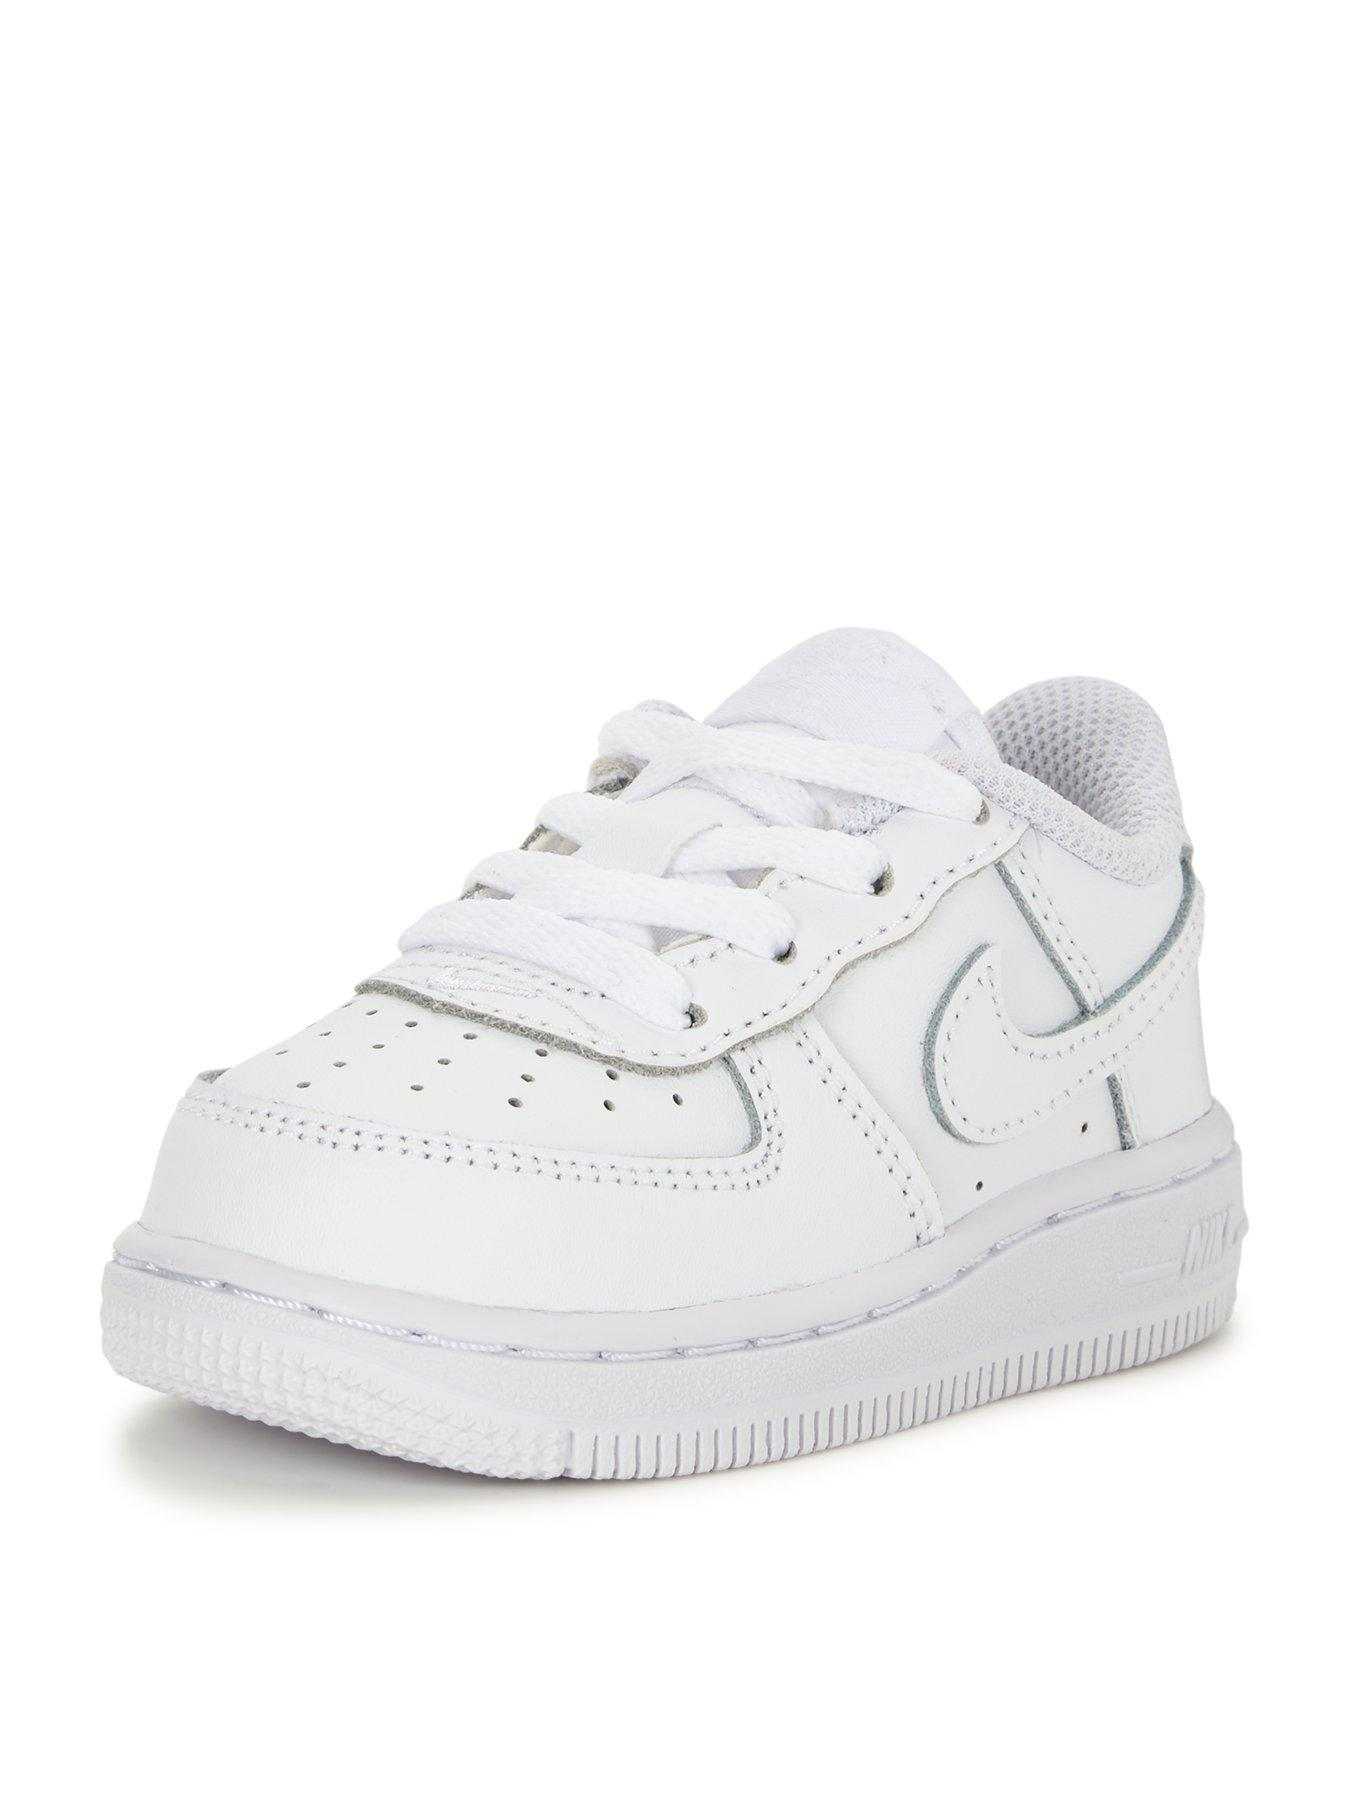 Nike Nike Air Force 1 '06 Infant Trainer